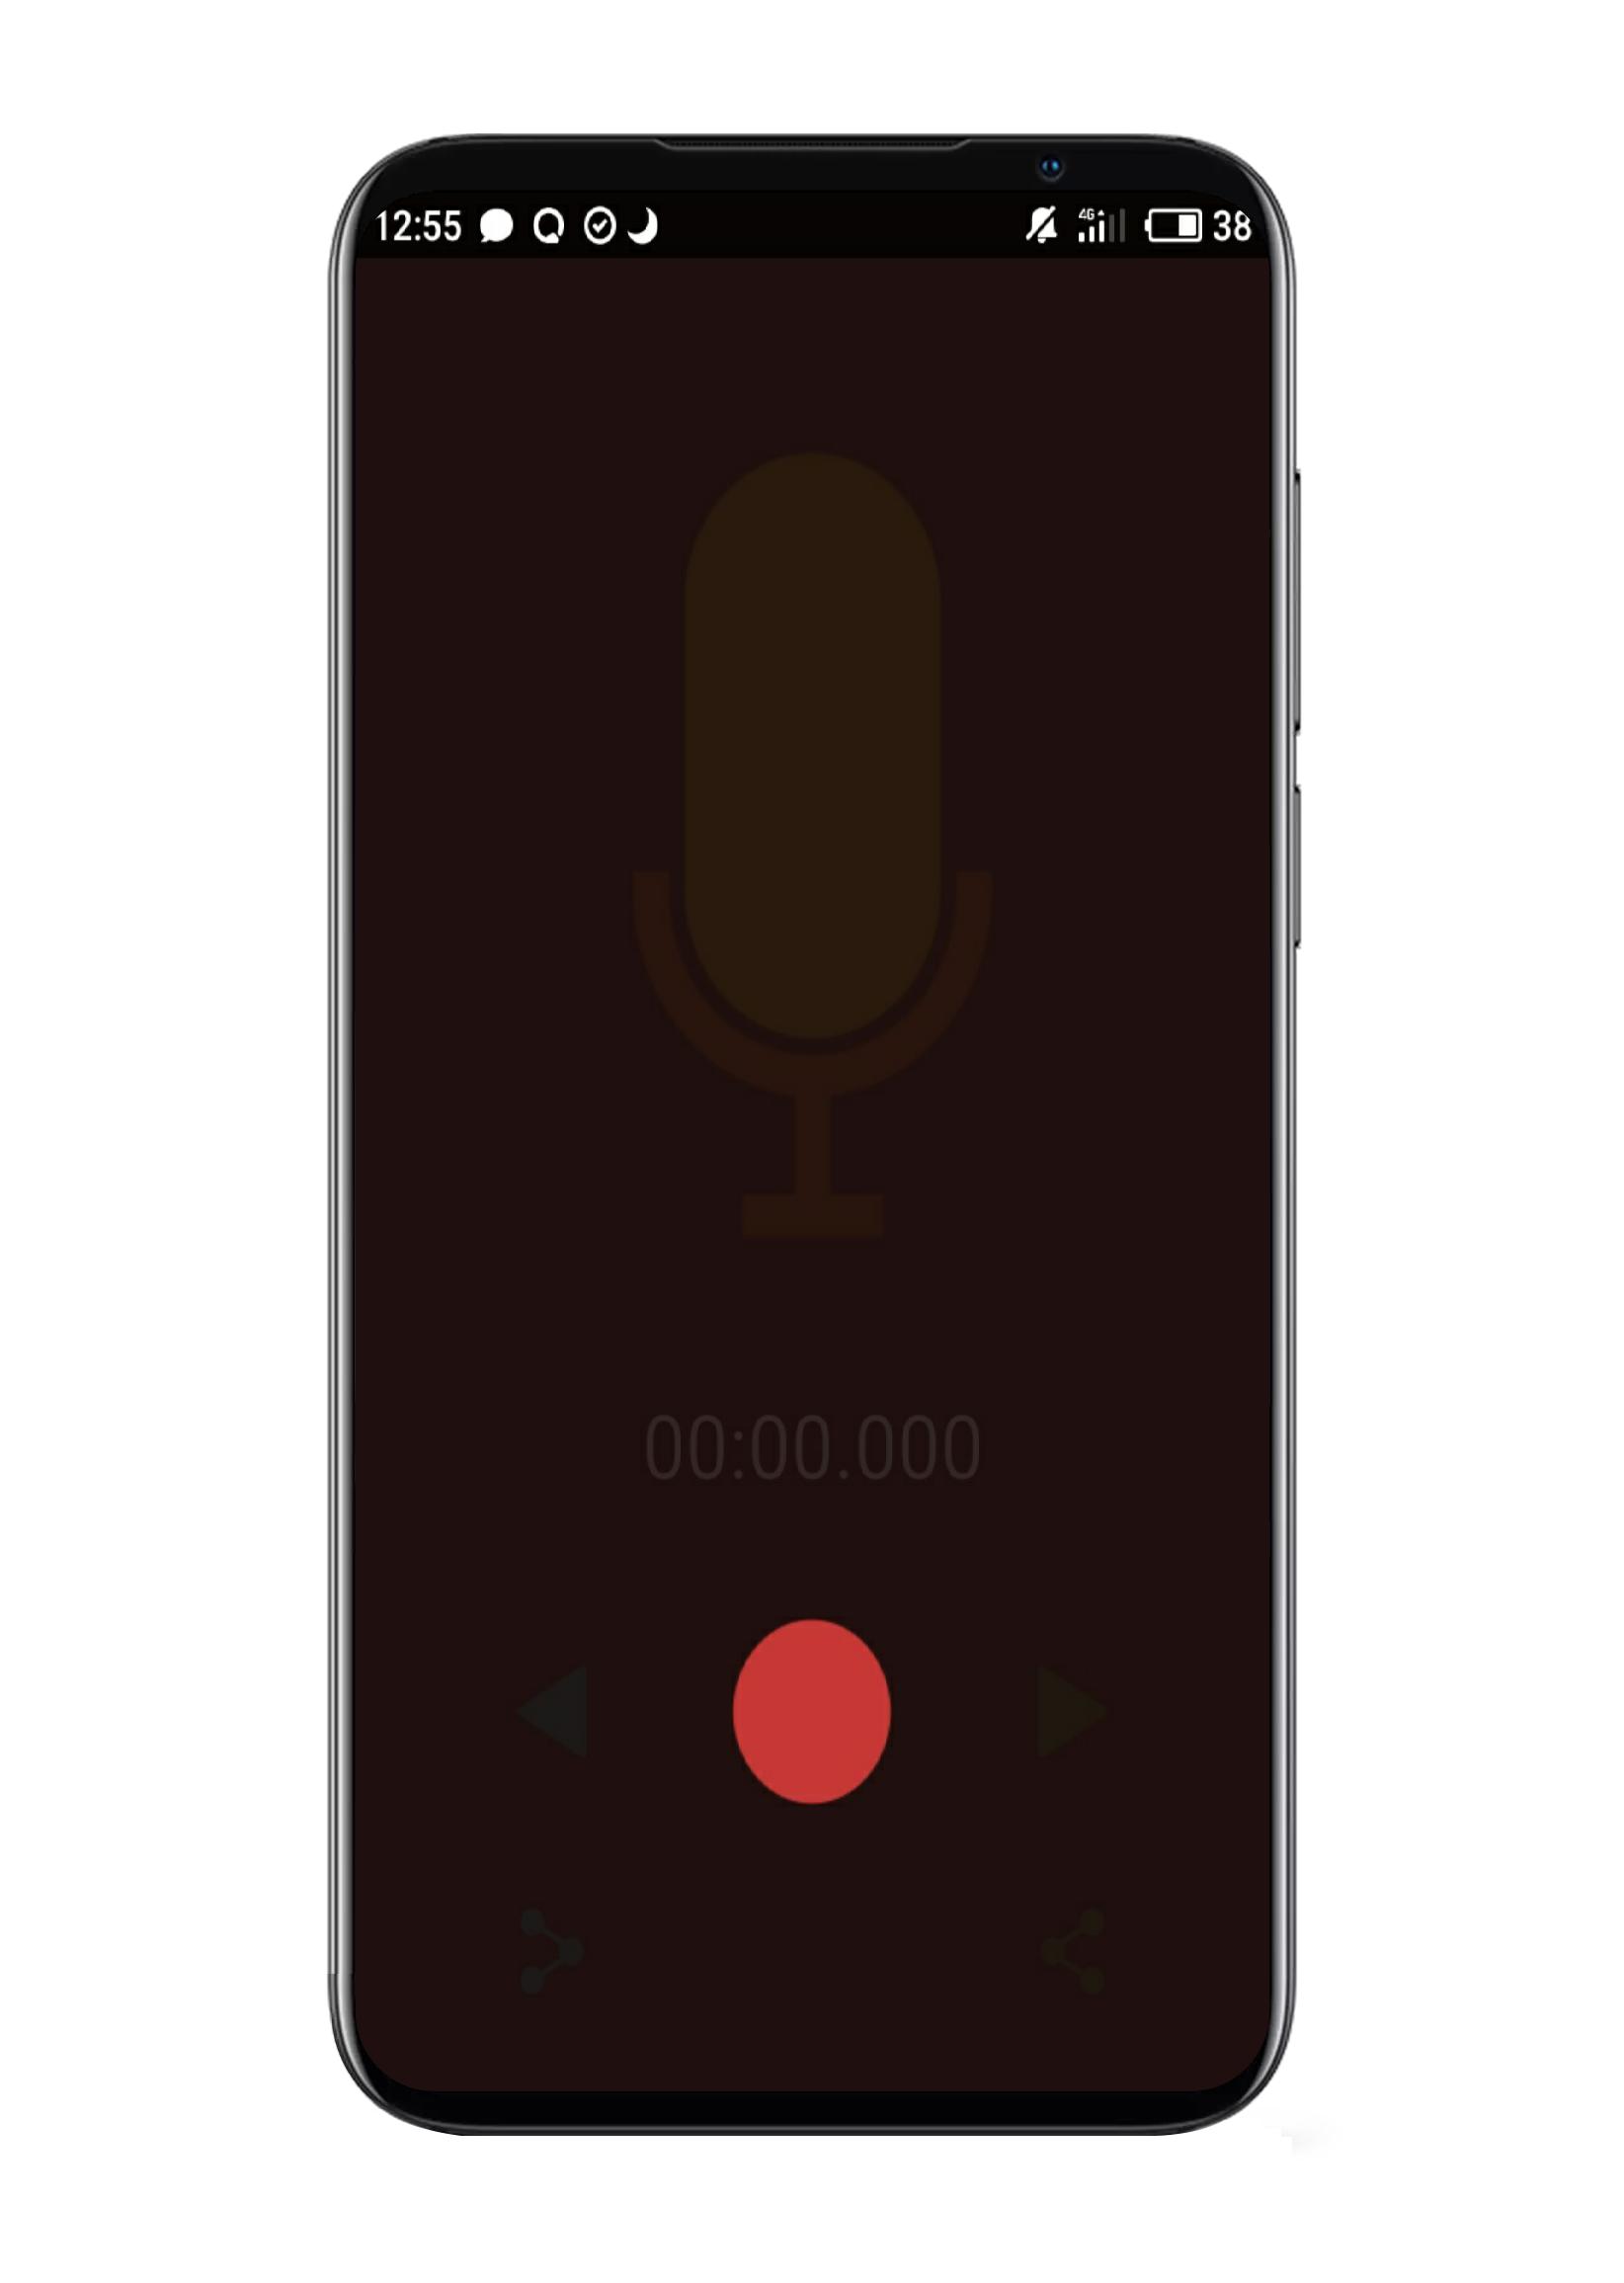 【分享】ReSpeak 1.0.170116.0 (8)-爱小助